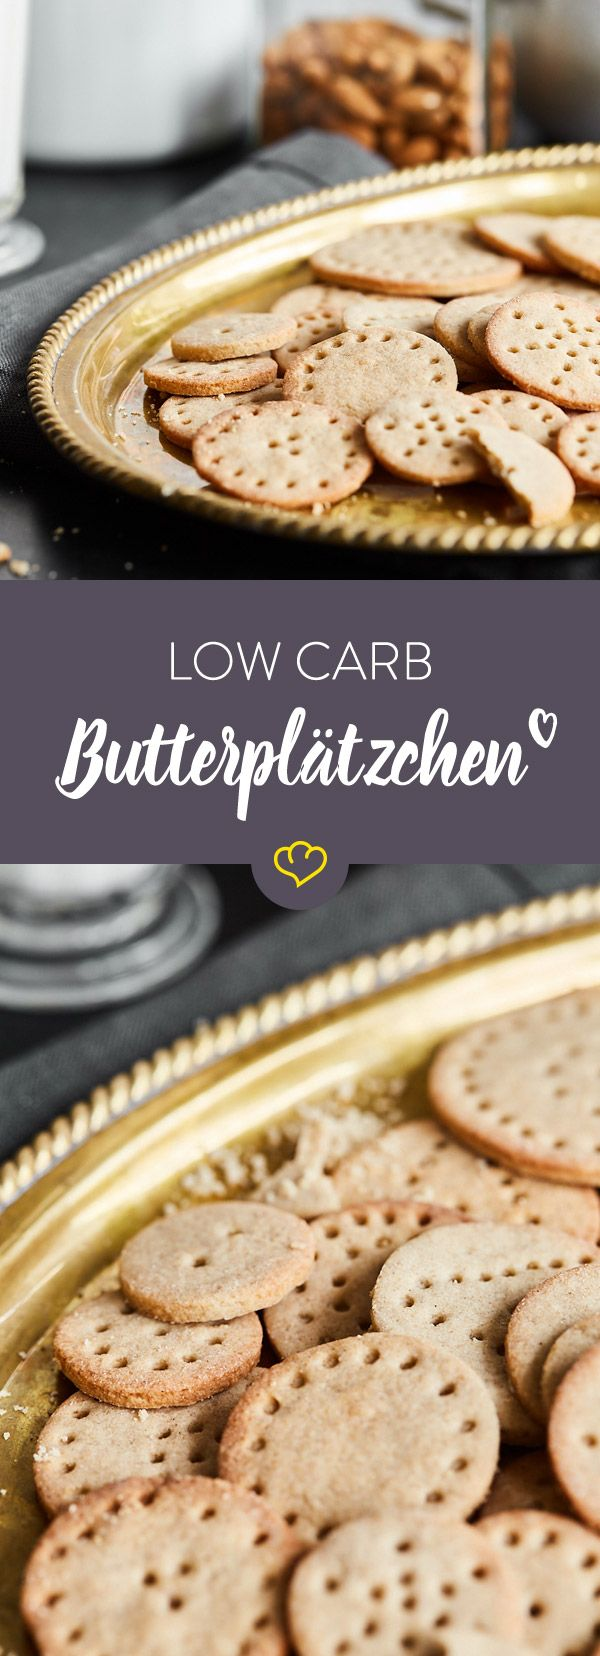 low carb butterpl tzchen zum ausstechen rezept in 2018 lecker pinterest buchweizenmehl. Black Bedroom Furniture Sets. Home Design Ideas